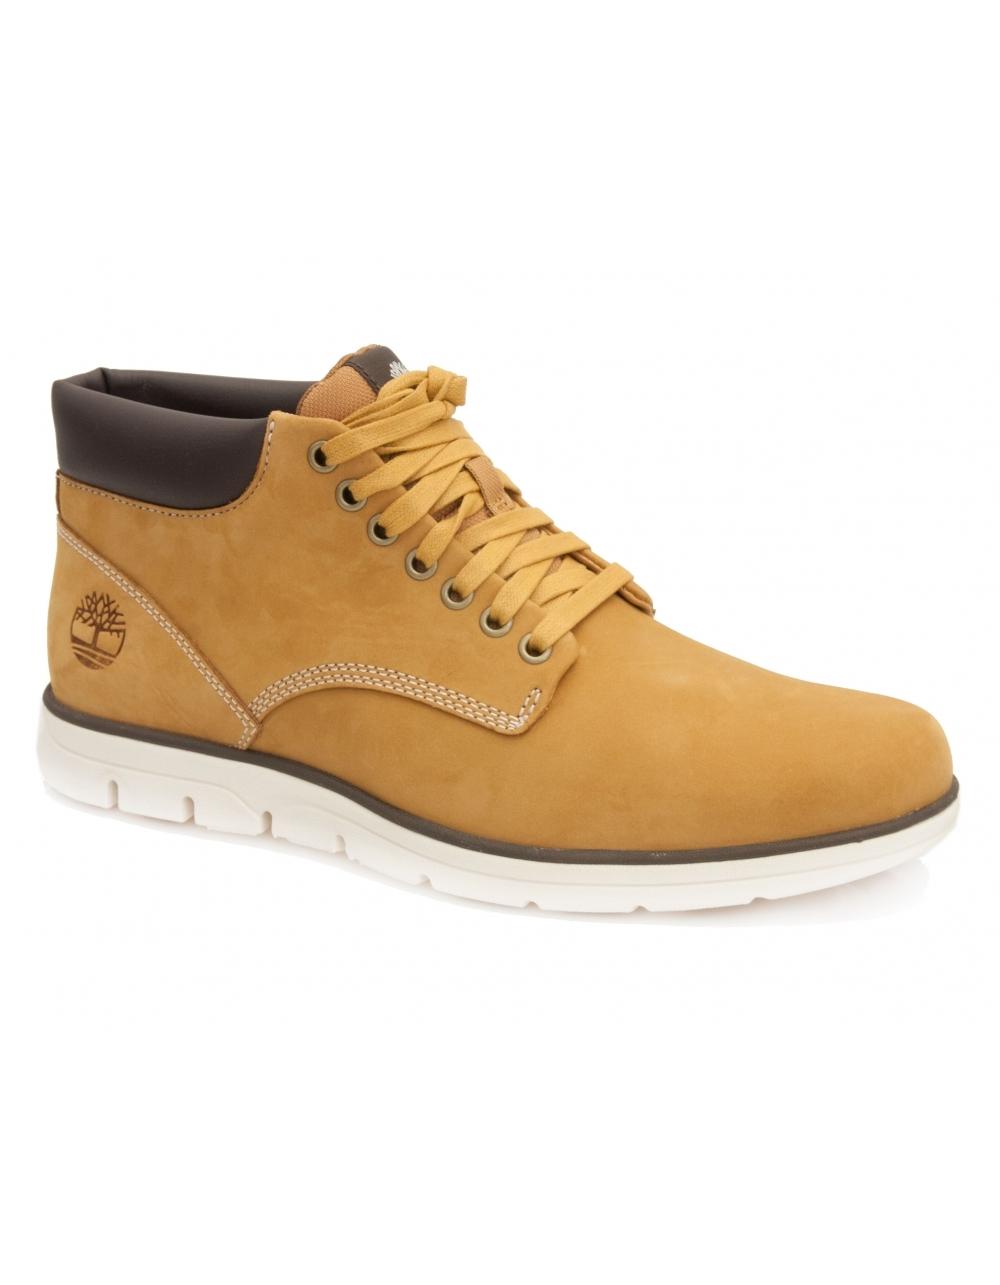 d0983b474b5 Timberland Bradstreet Chukka Boot - Wheat